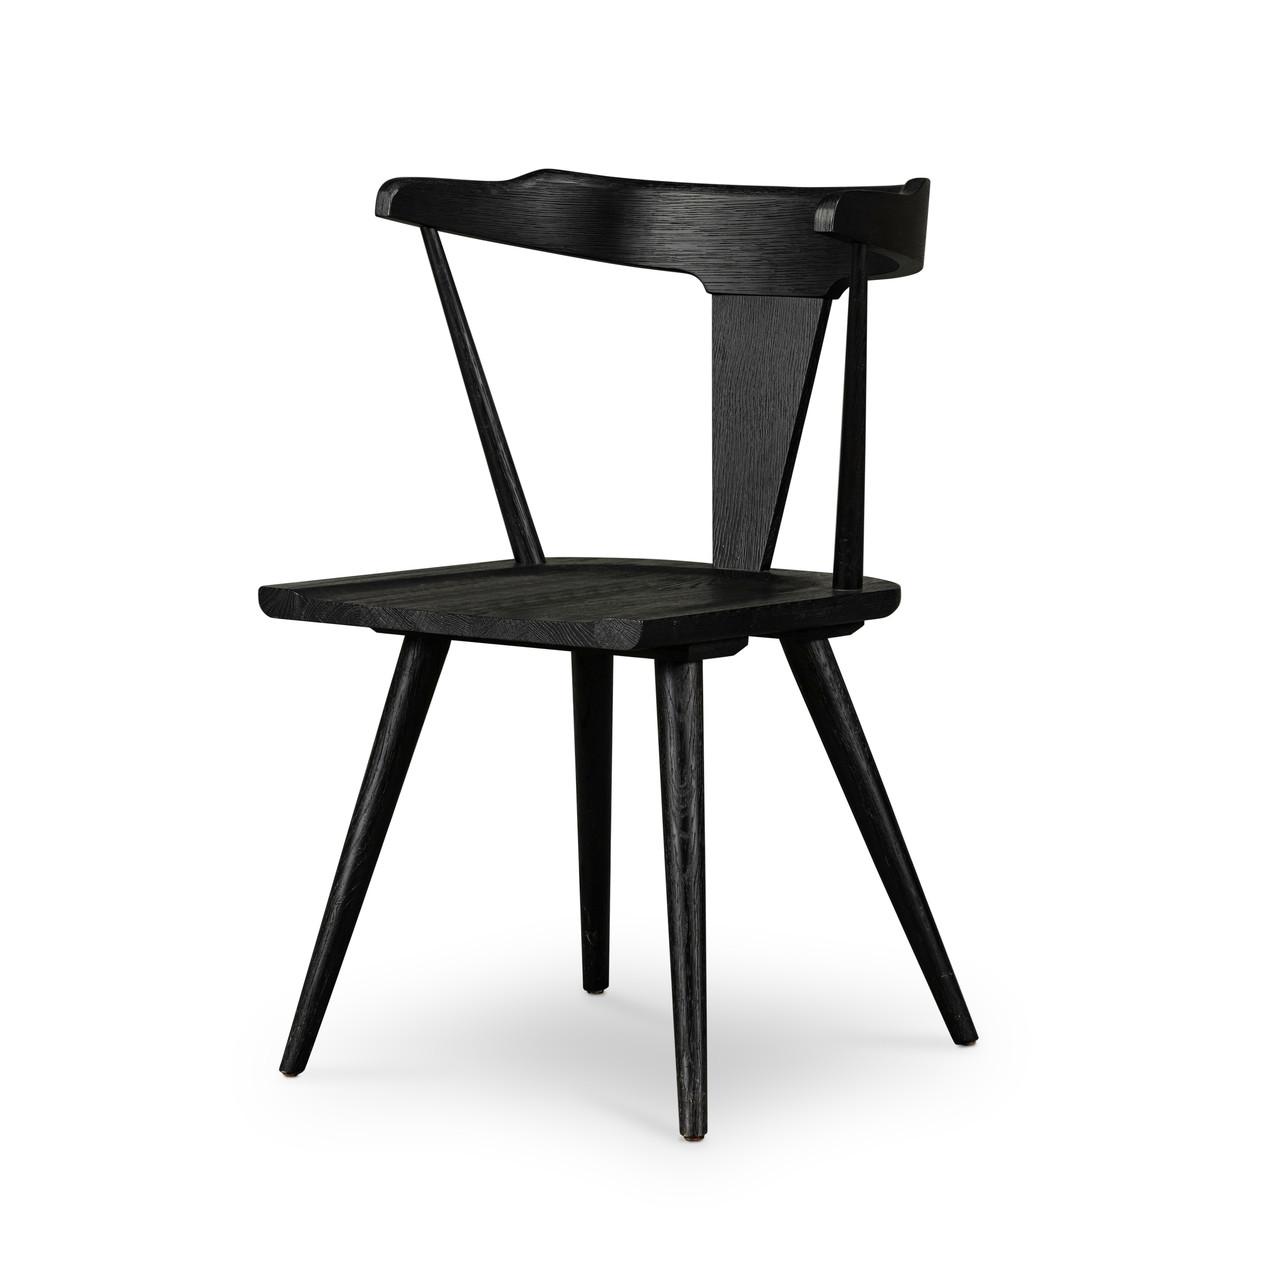 Windsor Oak Ripley Dining Chair - Multi Color